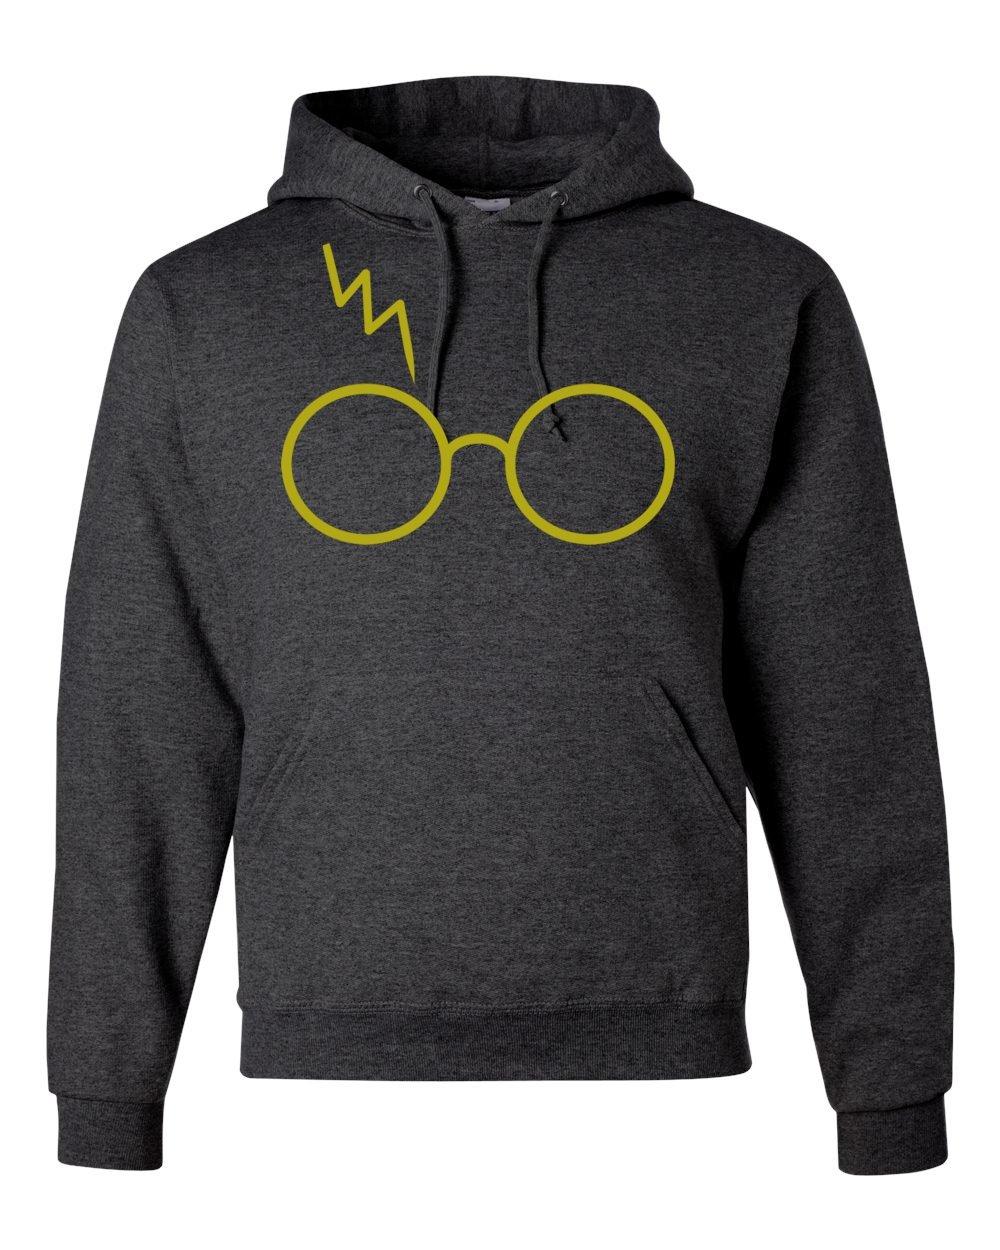 Harry Potter Glasses Scar Unisex Hooded Sweatshirt Fashion Hoodie